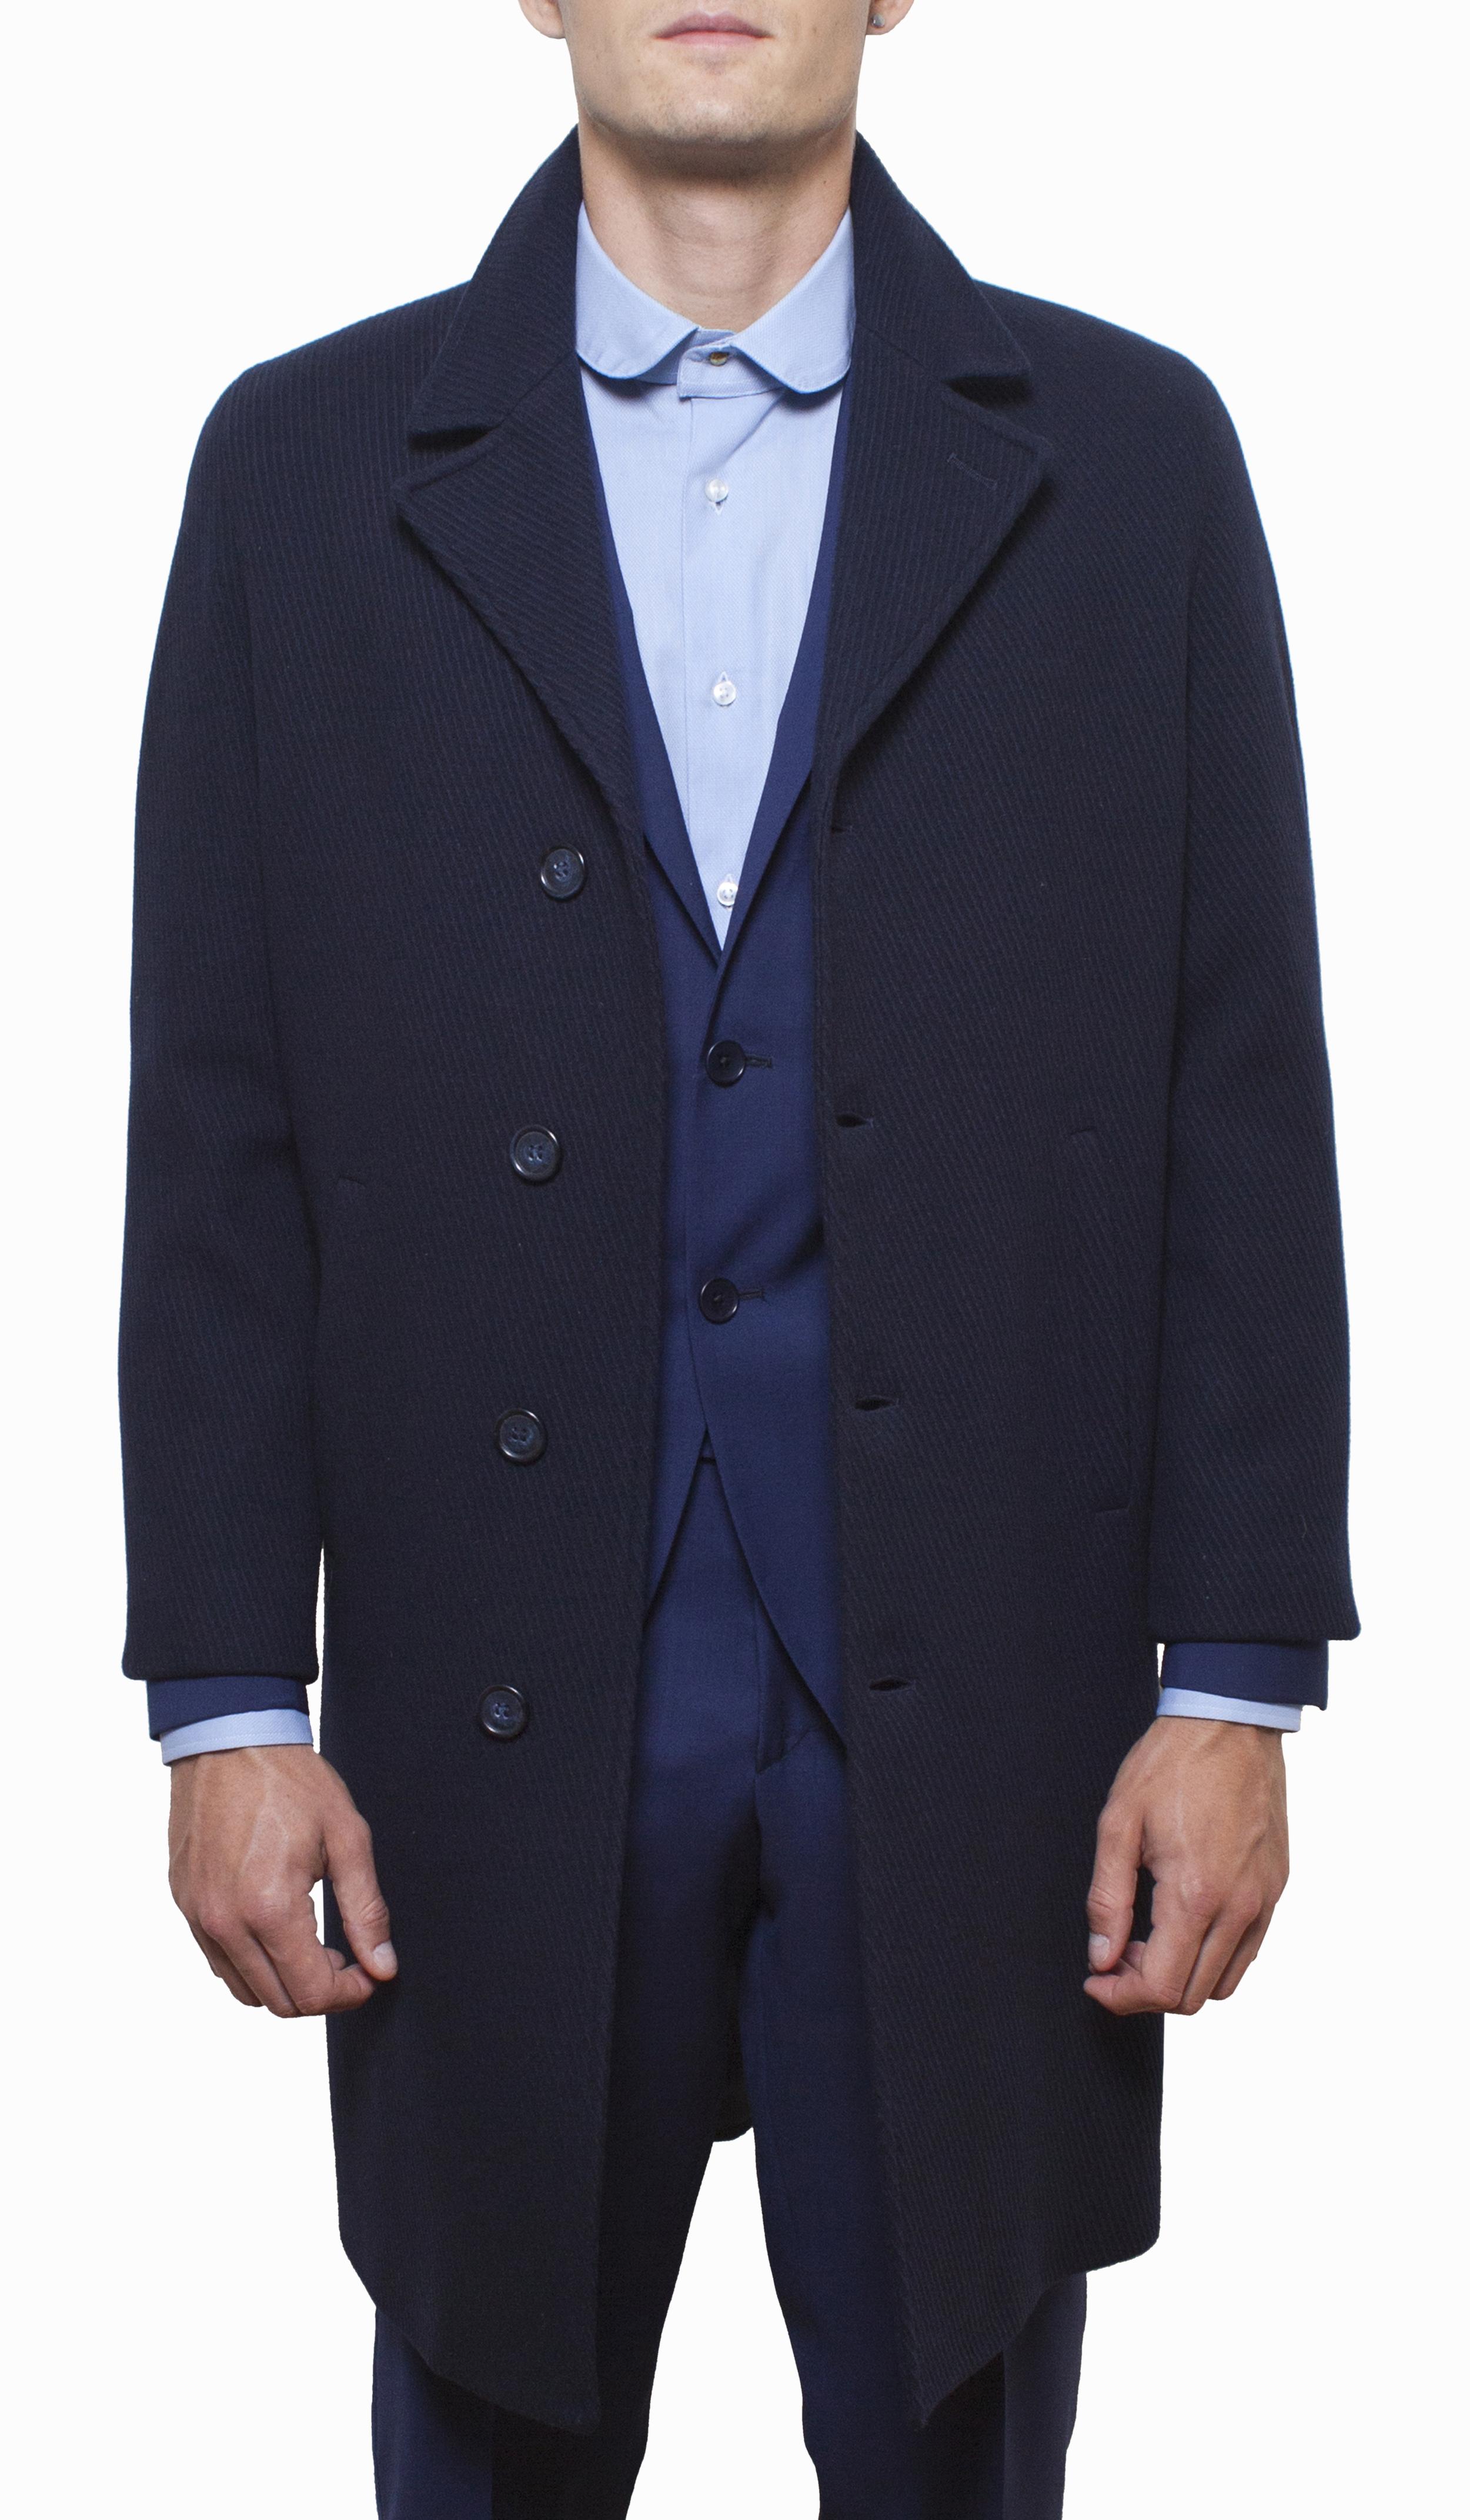 coatBLUE.jpg